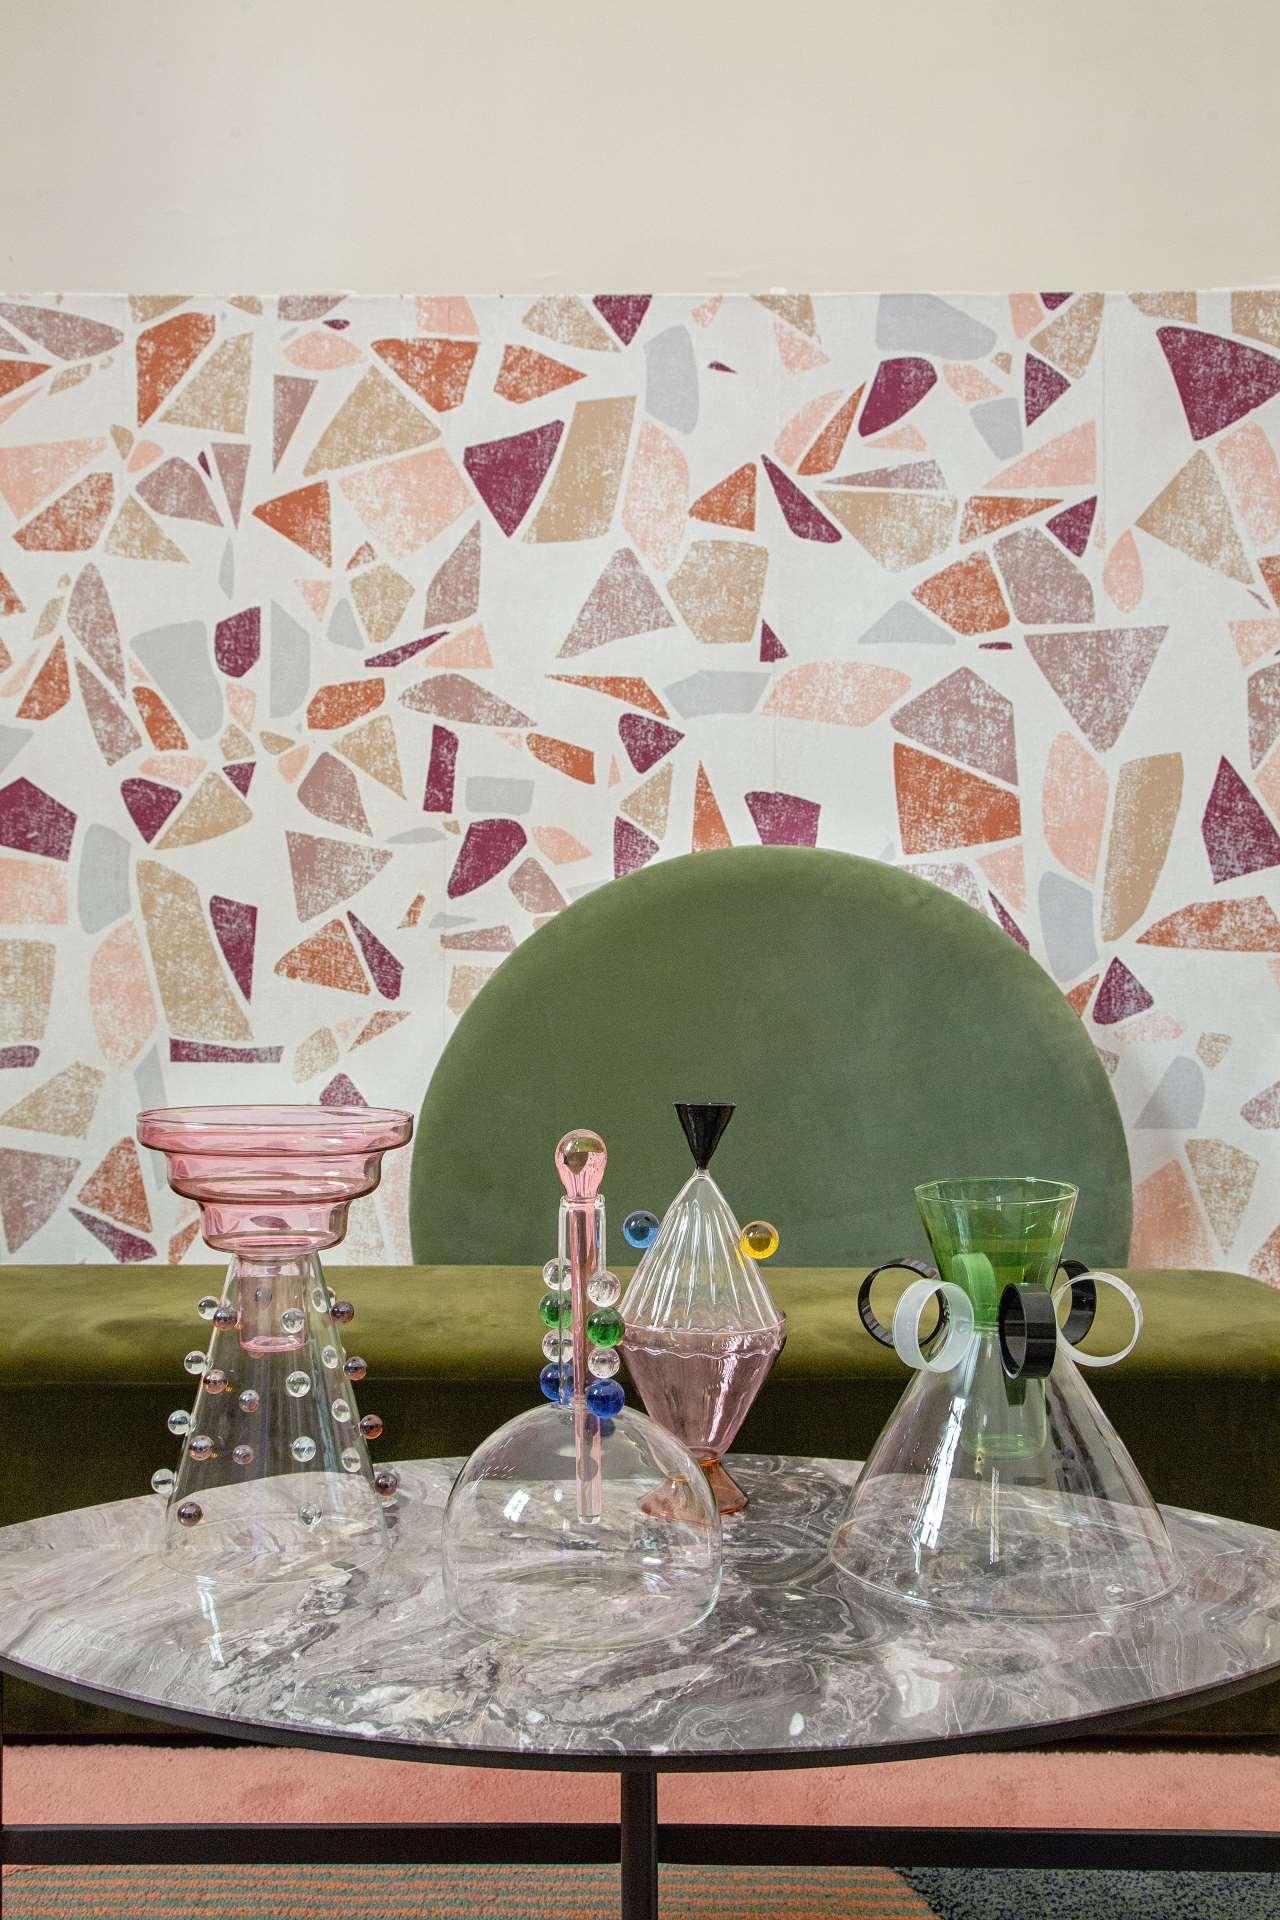 EDIT Napoli exhibition view, 'Arabesque' series of glass vases by Serena Confalonieri, part of Pamono installation. Photo © Roberto Pierucci.